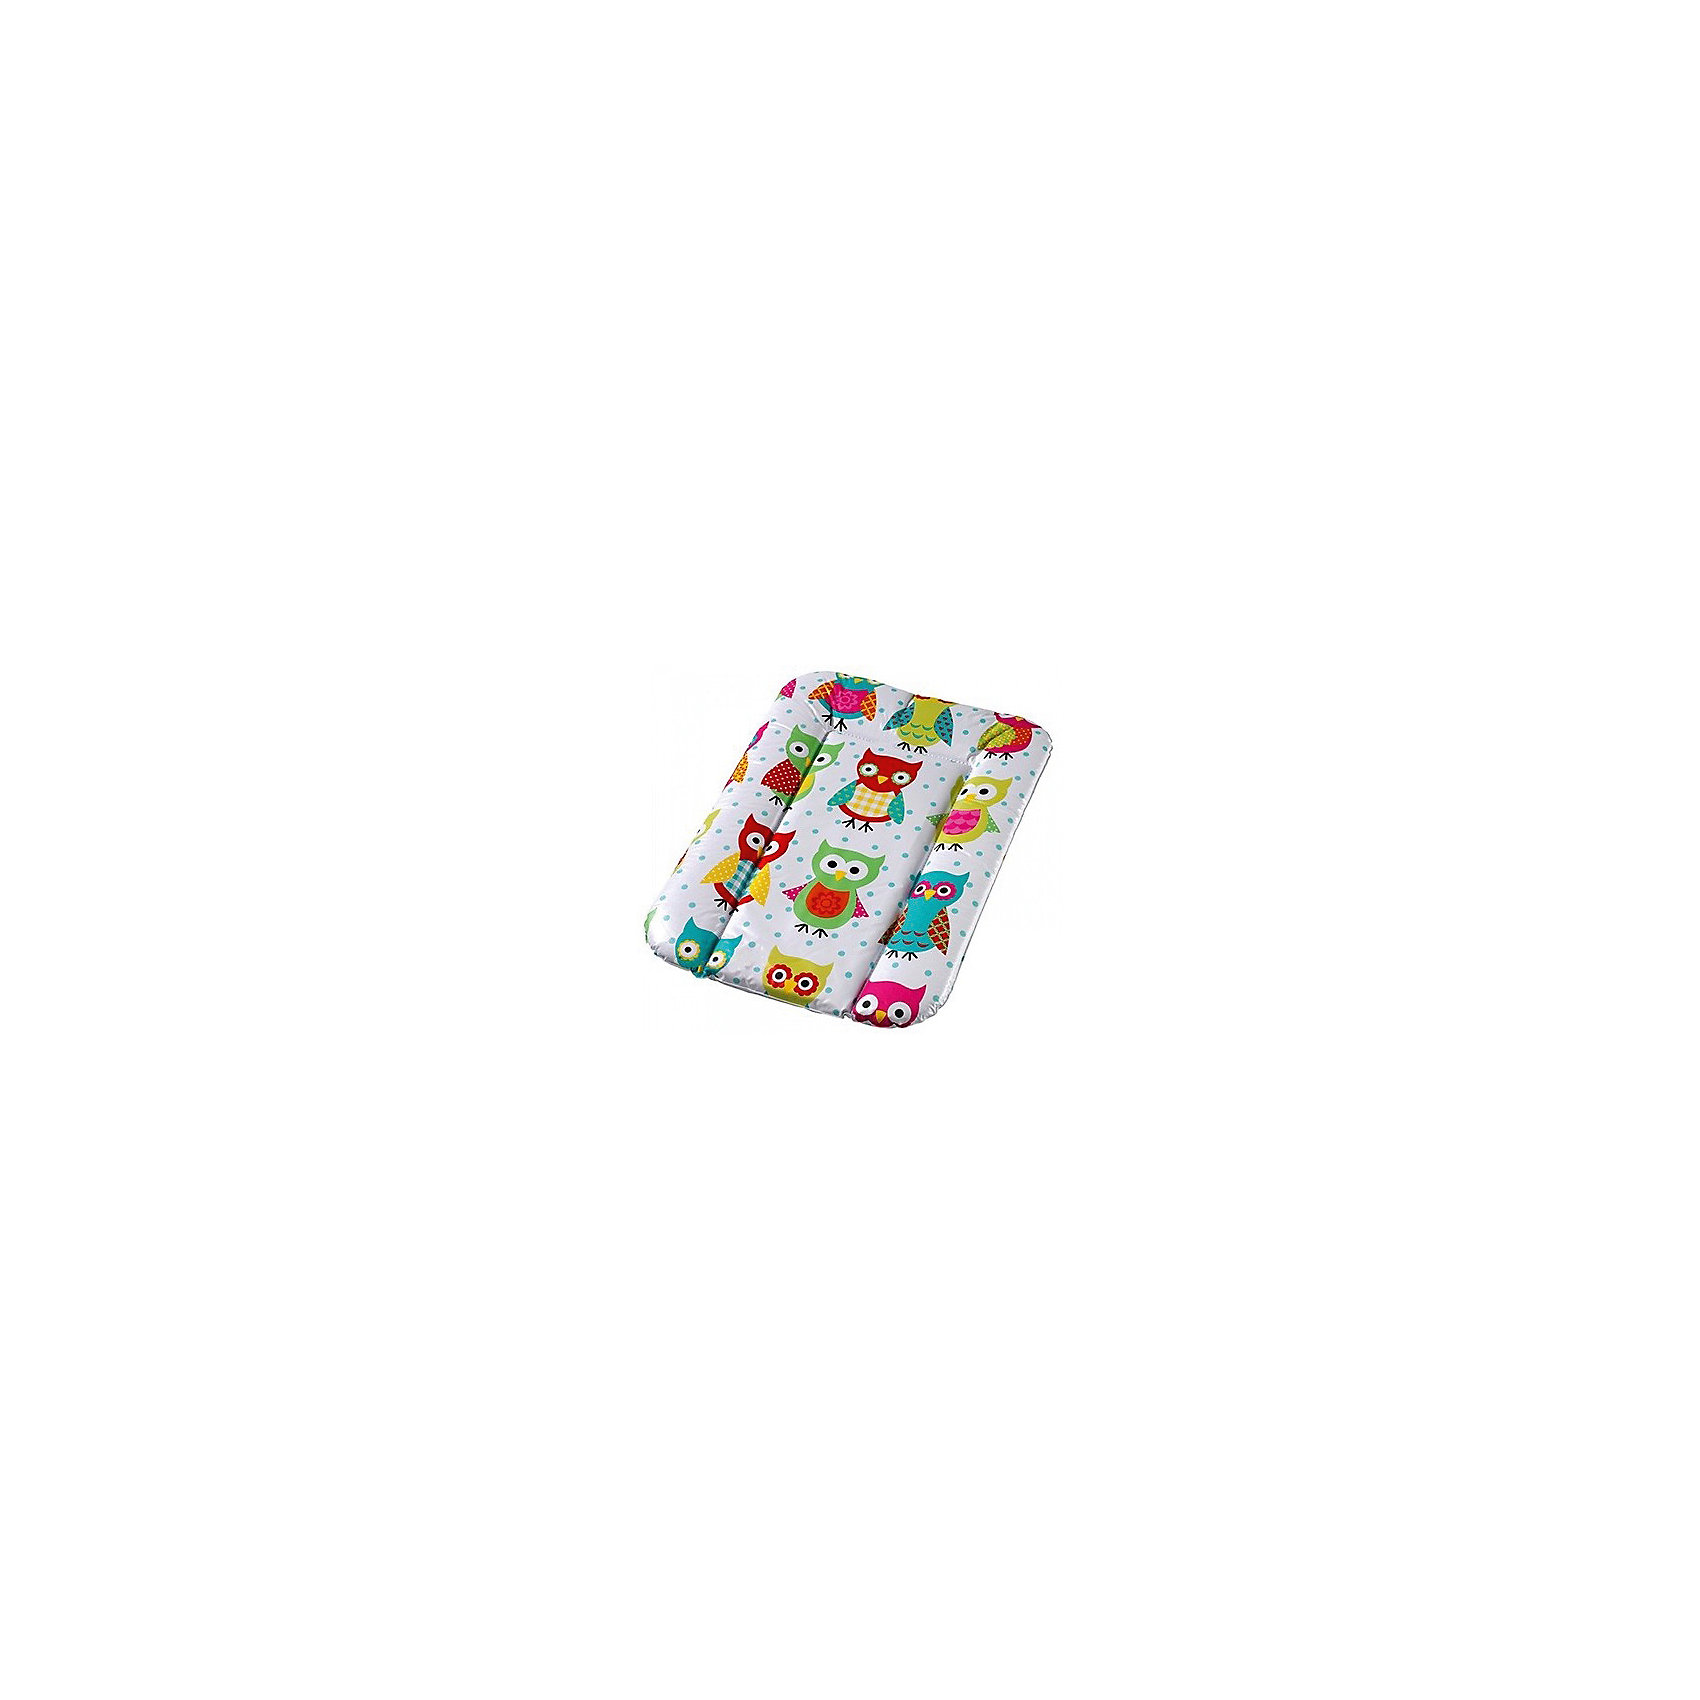 Geuther Матрас для пеленания, Geuther накладки для пеленания candide накладка для пеленания с валиками comfort 70х50 см